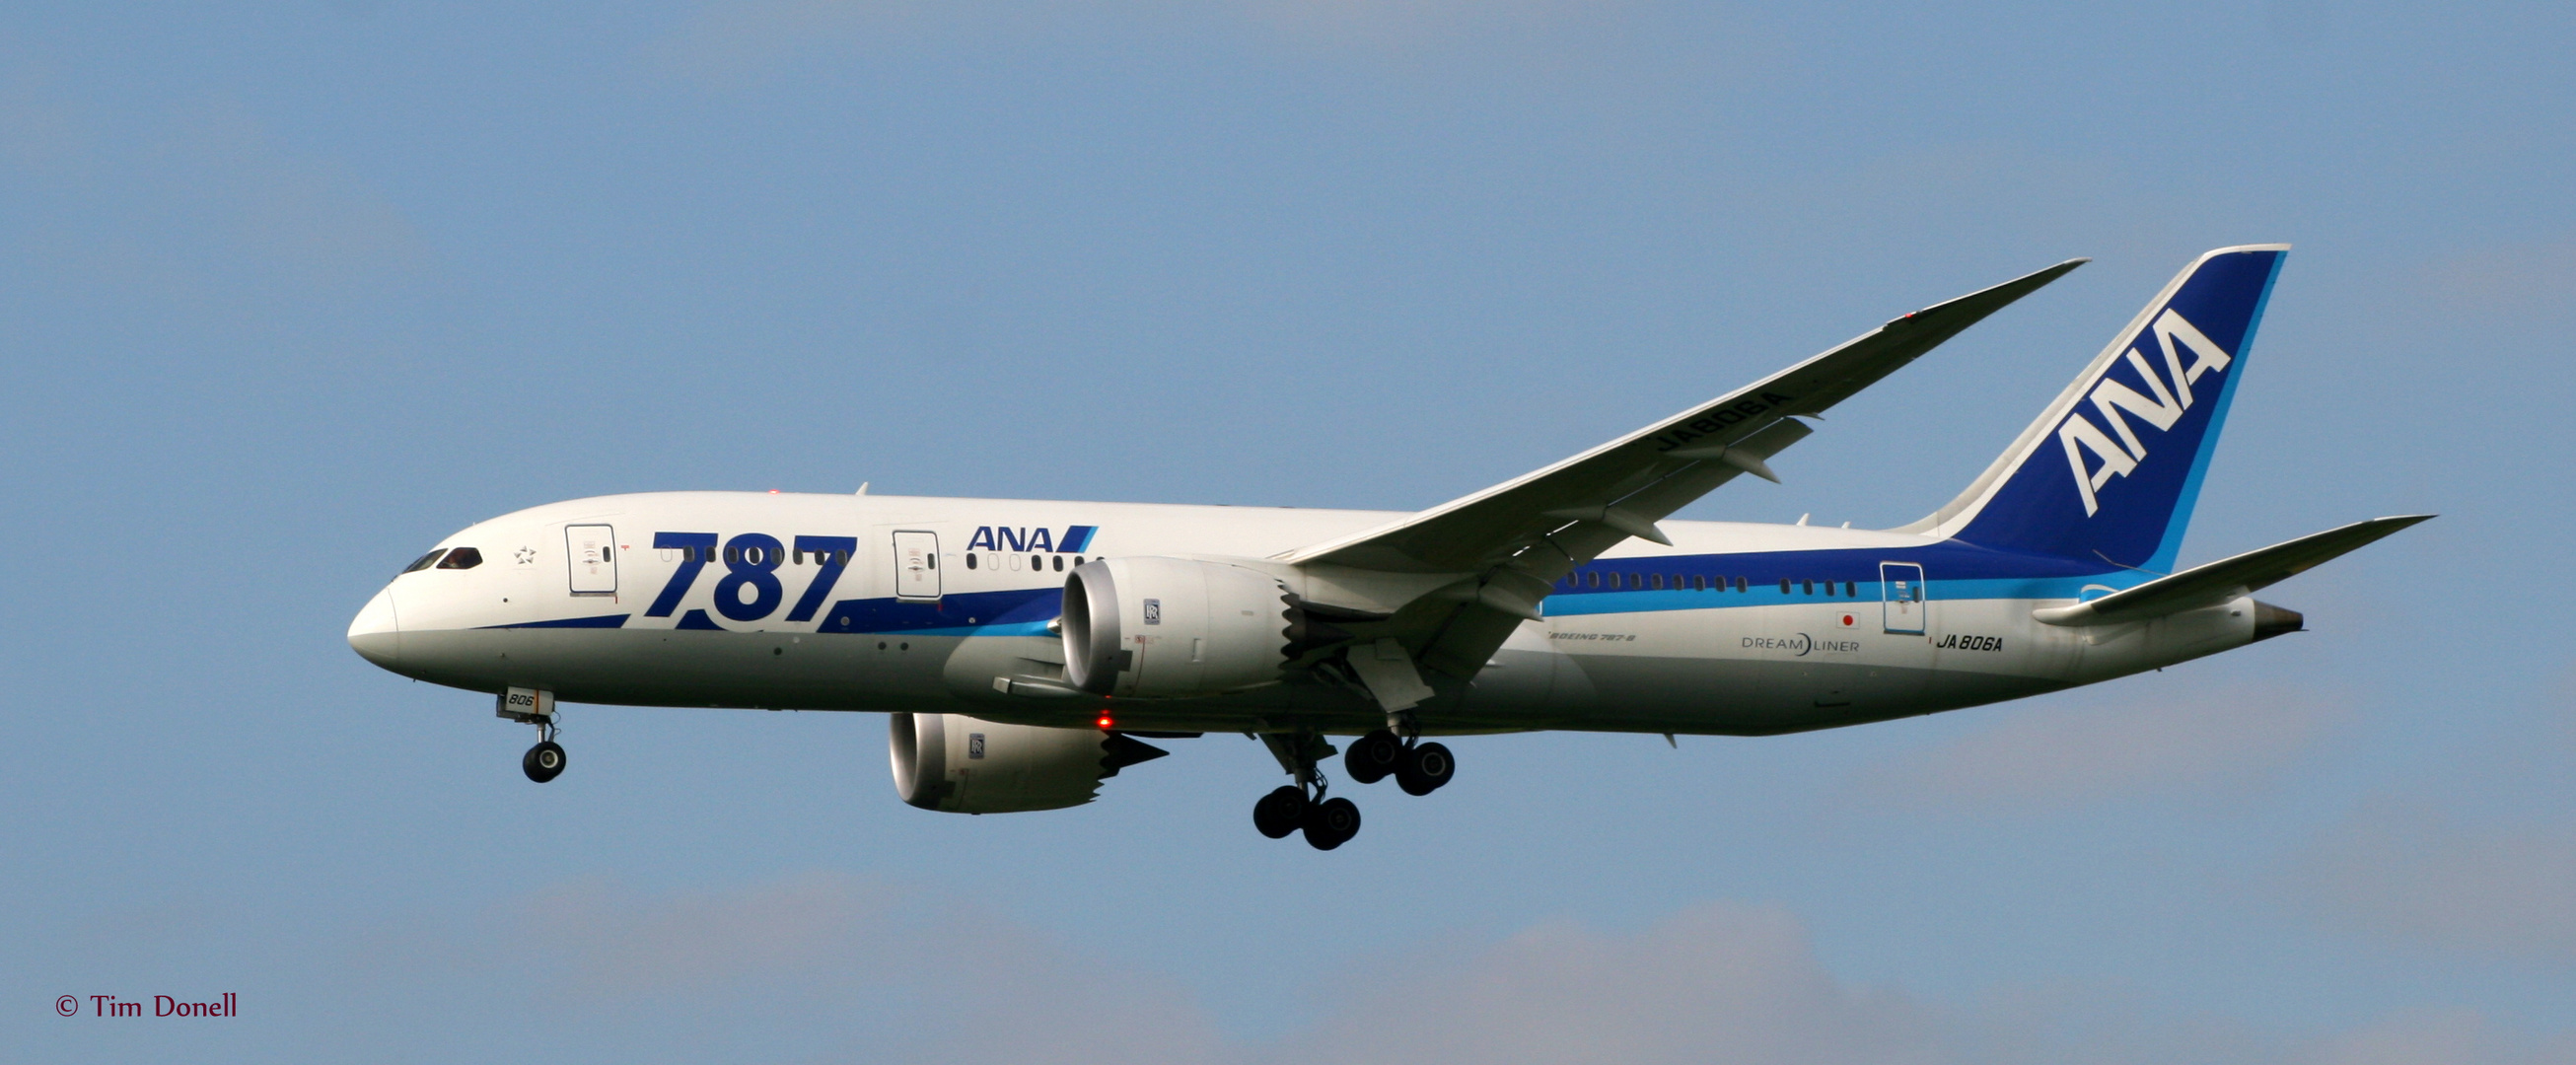 Boeing 787-8 (JA806A) All Nippon Airways